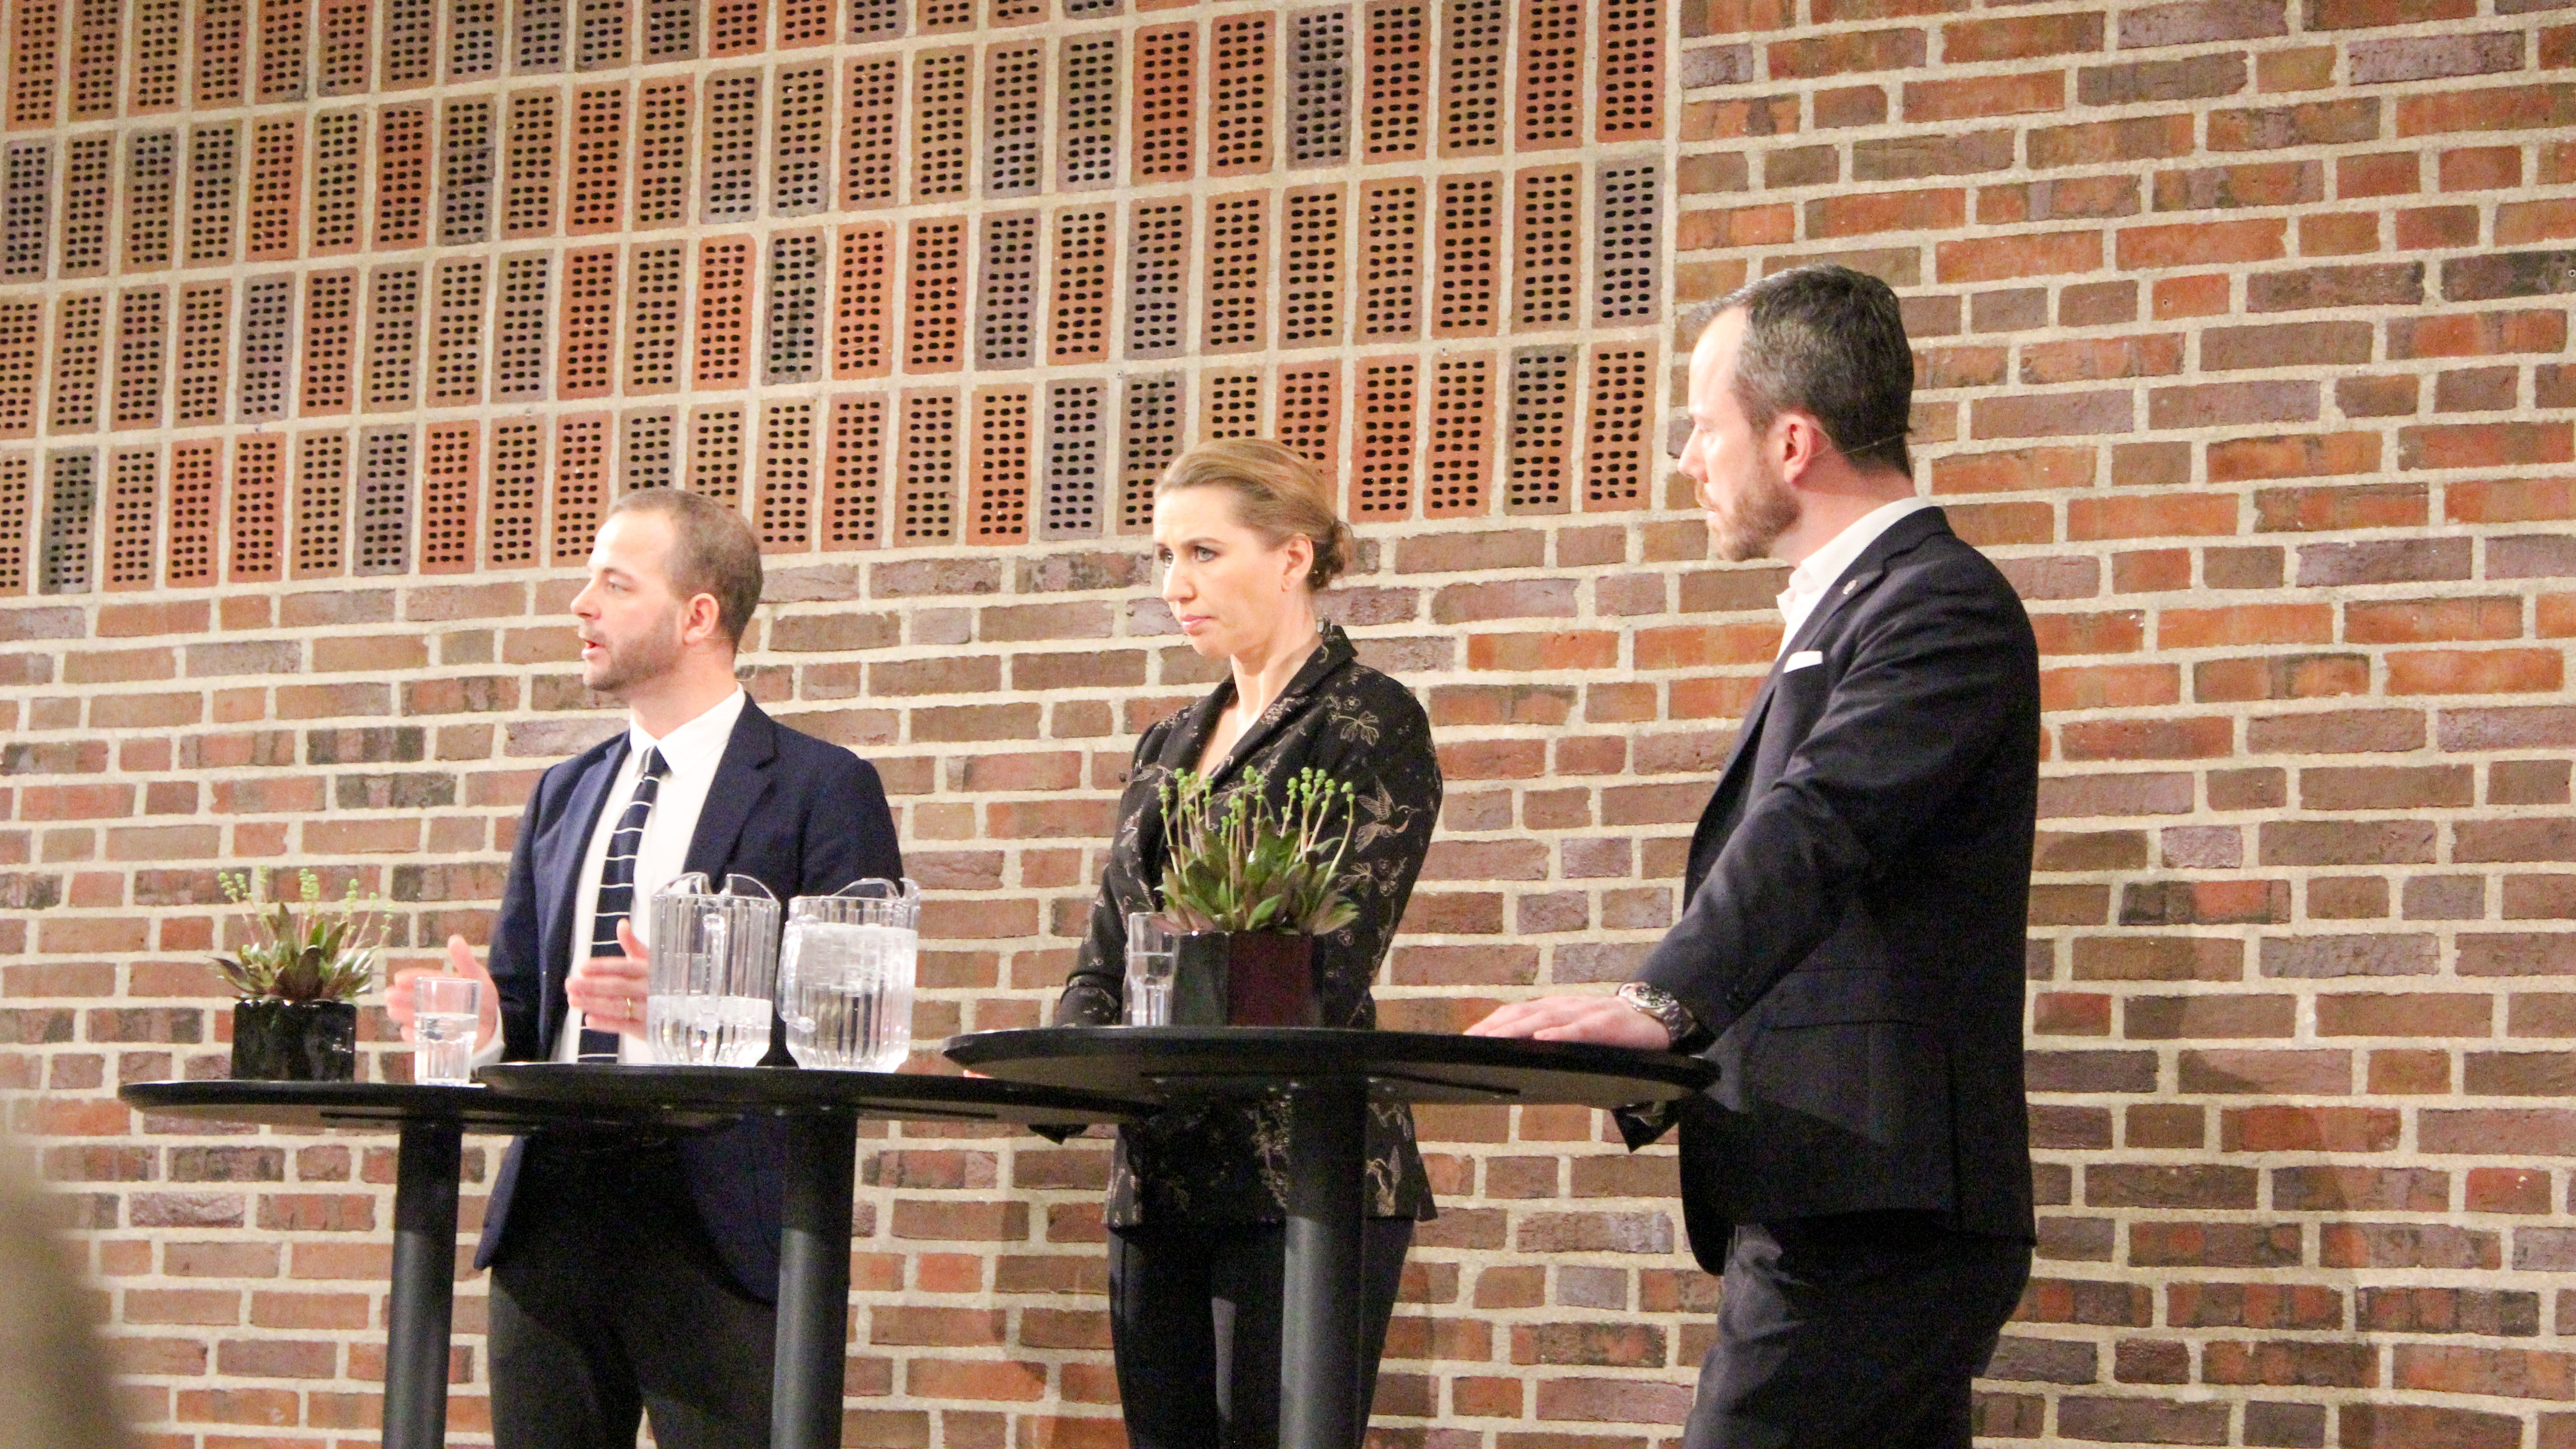 Ellemann Giver Ostergaard Kold Skulder Udlaendinge Splitter Os Netavisen Pio